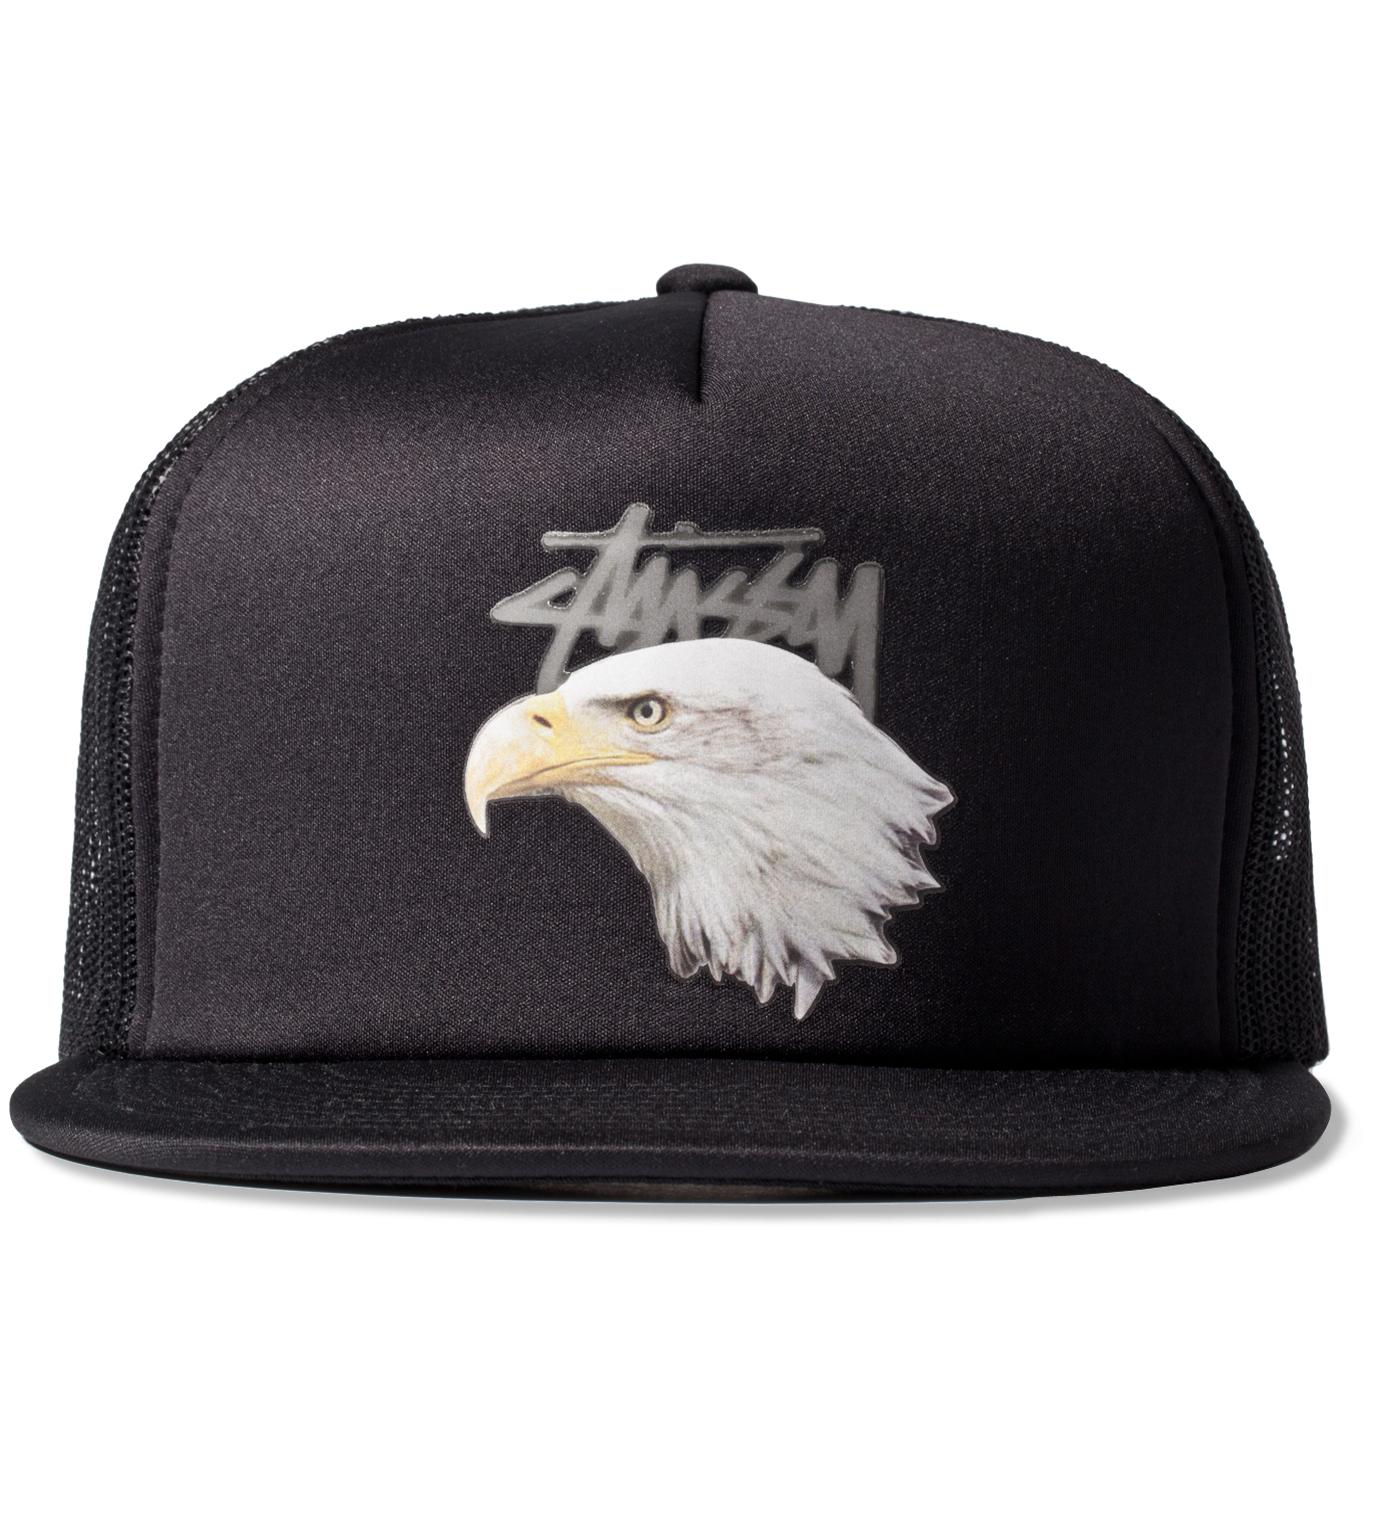 Stussy Black Animals Trucker Ballcap